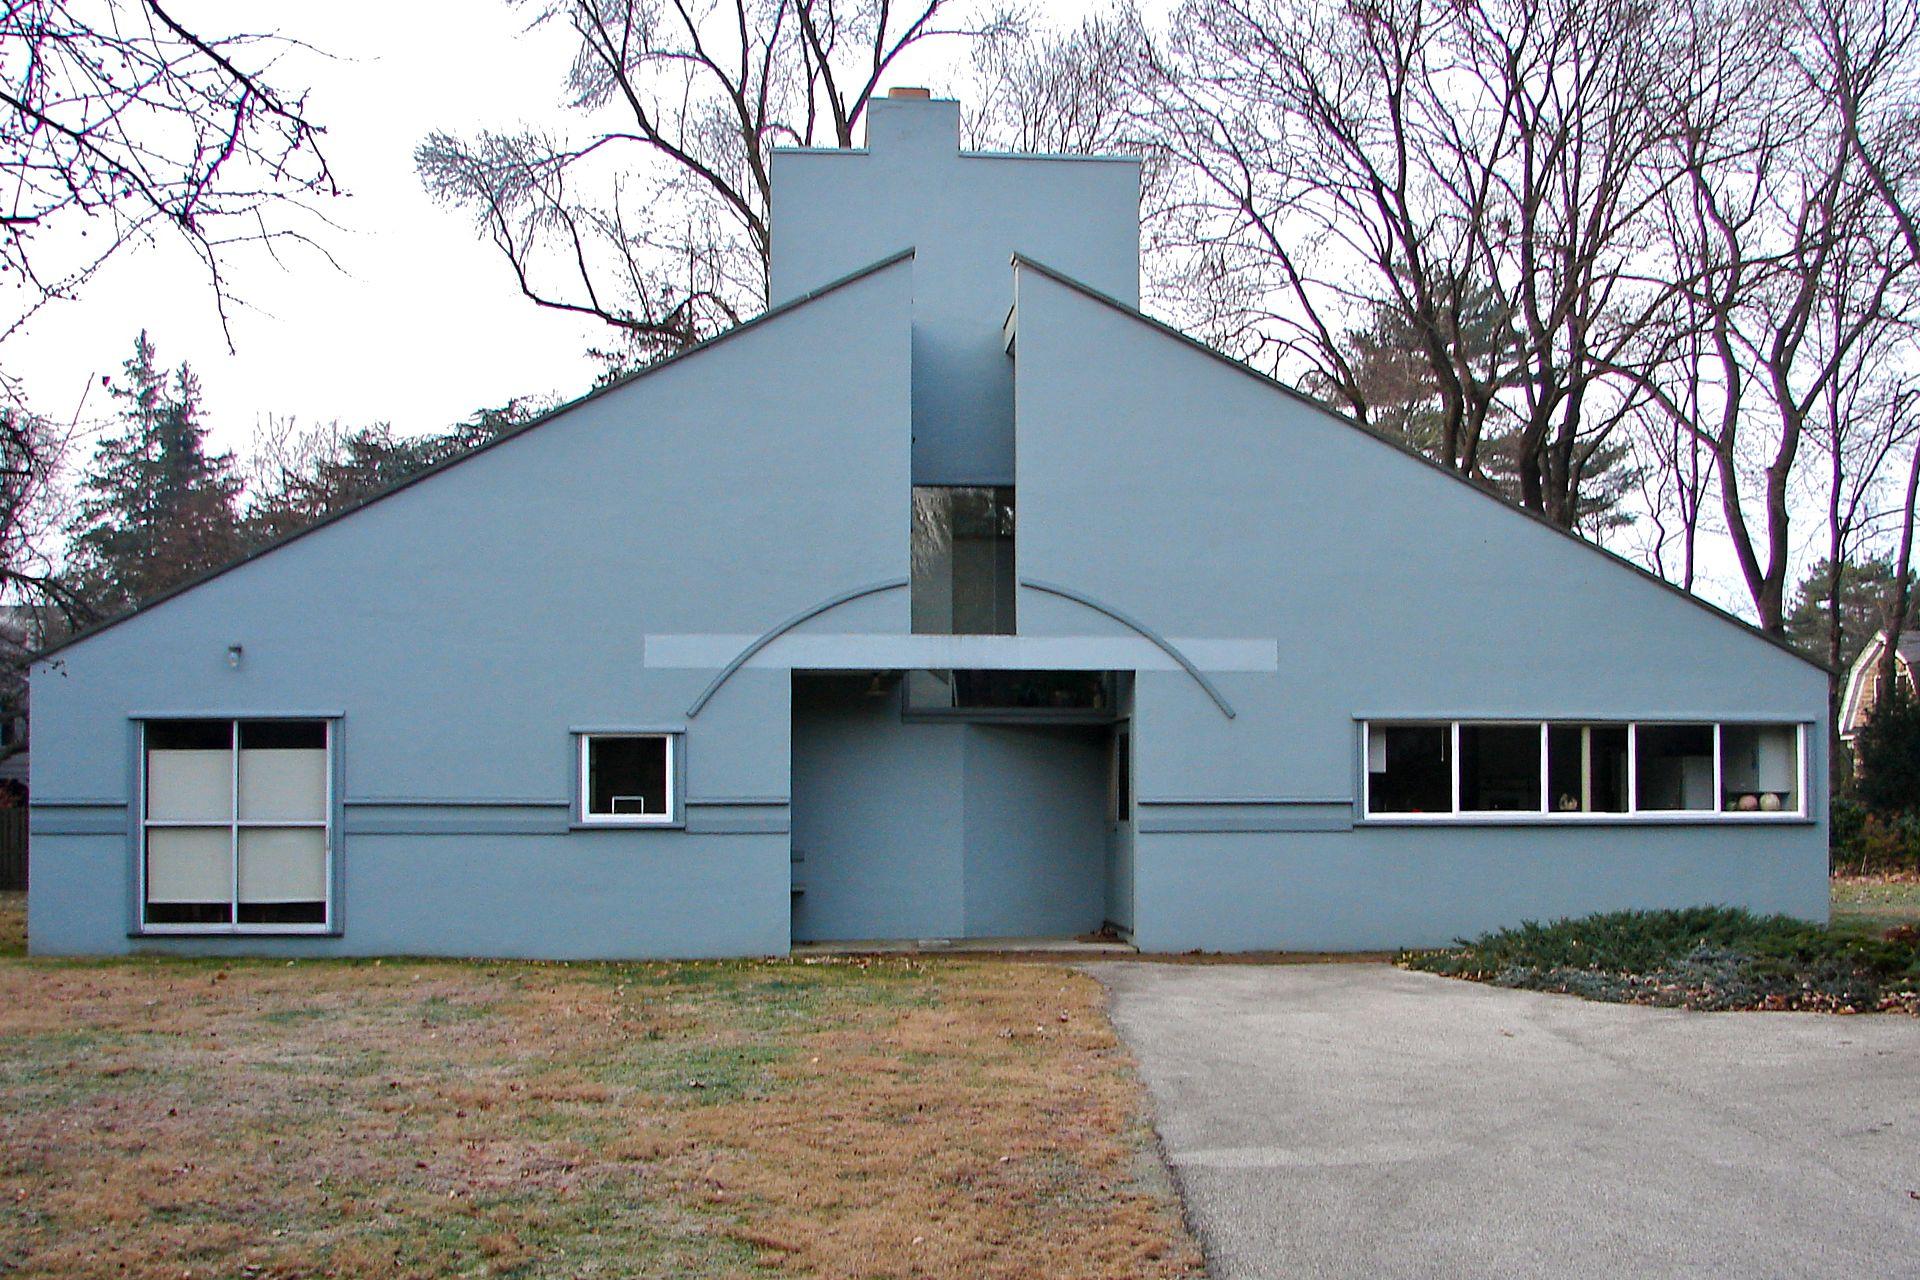 Vanna Venturi House (1962-64) by Robert Venturi in Philadelphia, Pennsylvania as one of the first Postmodernist architectural feats